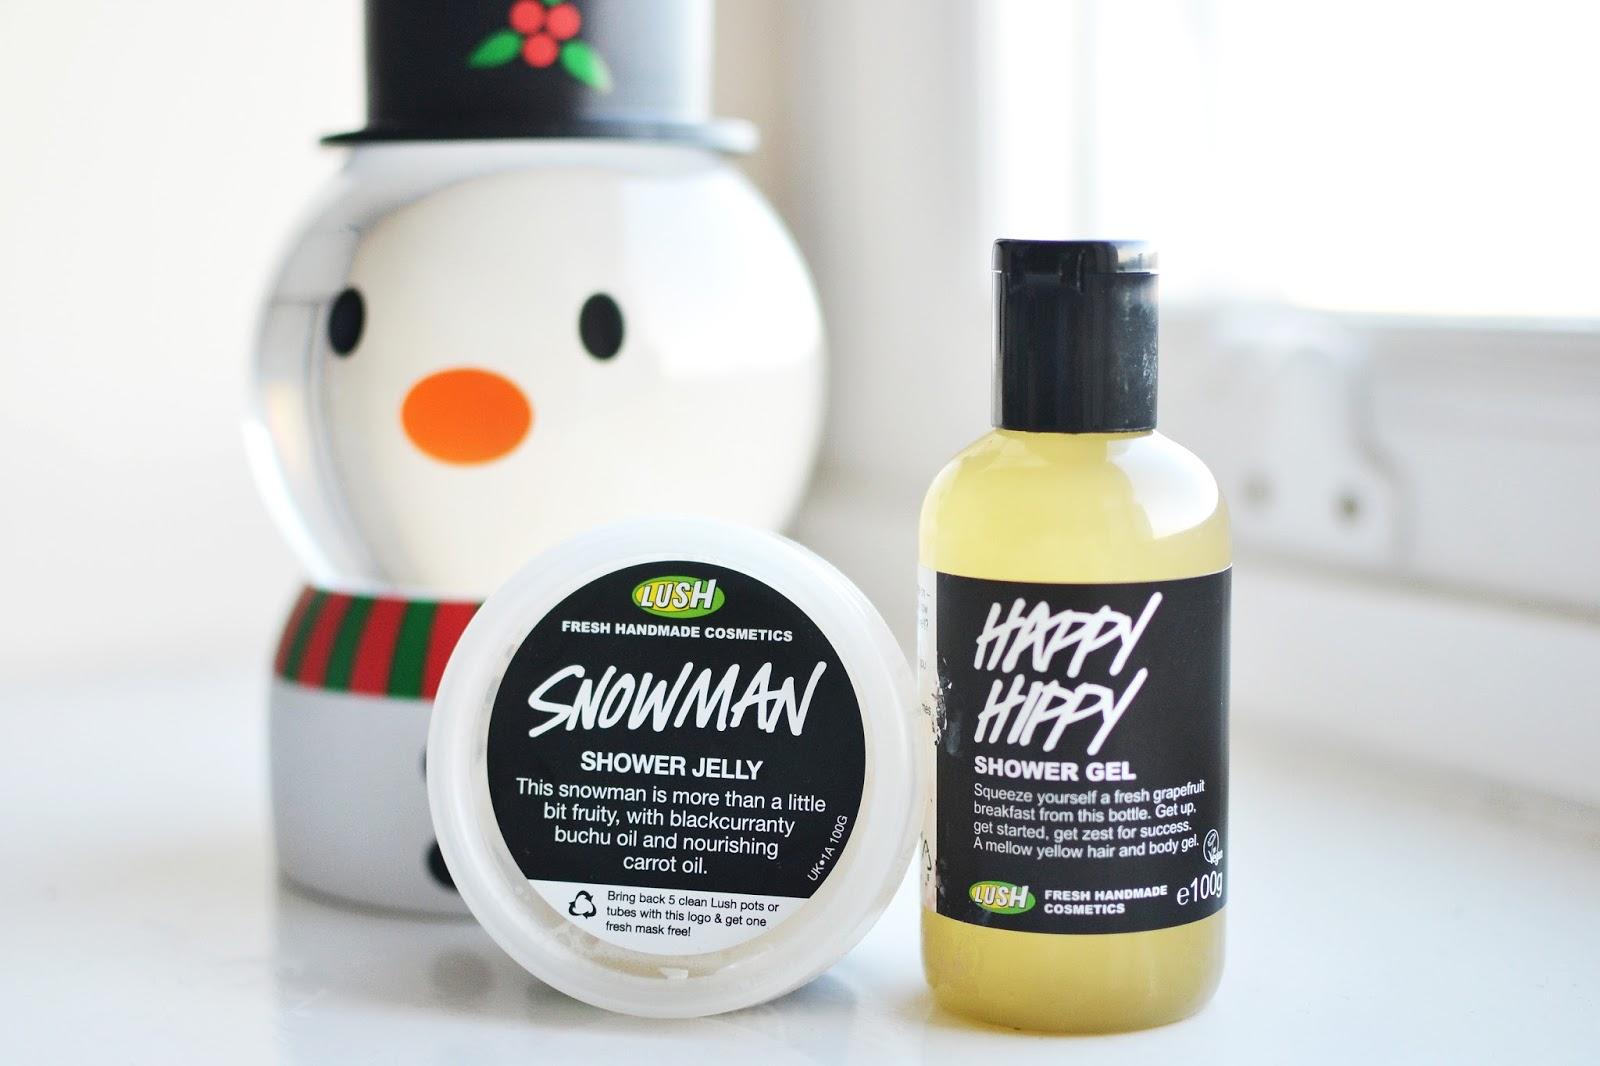 snowman shower jelly lush, lush happy hippy shower gel